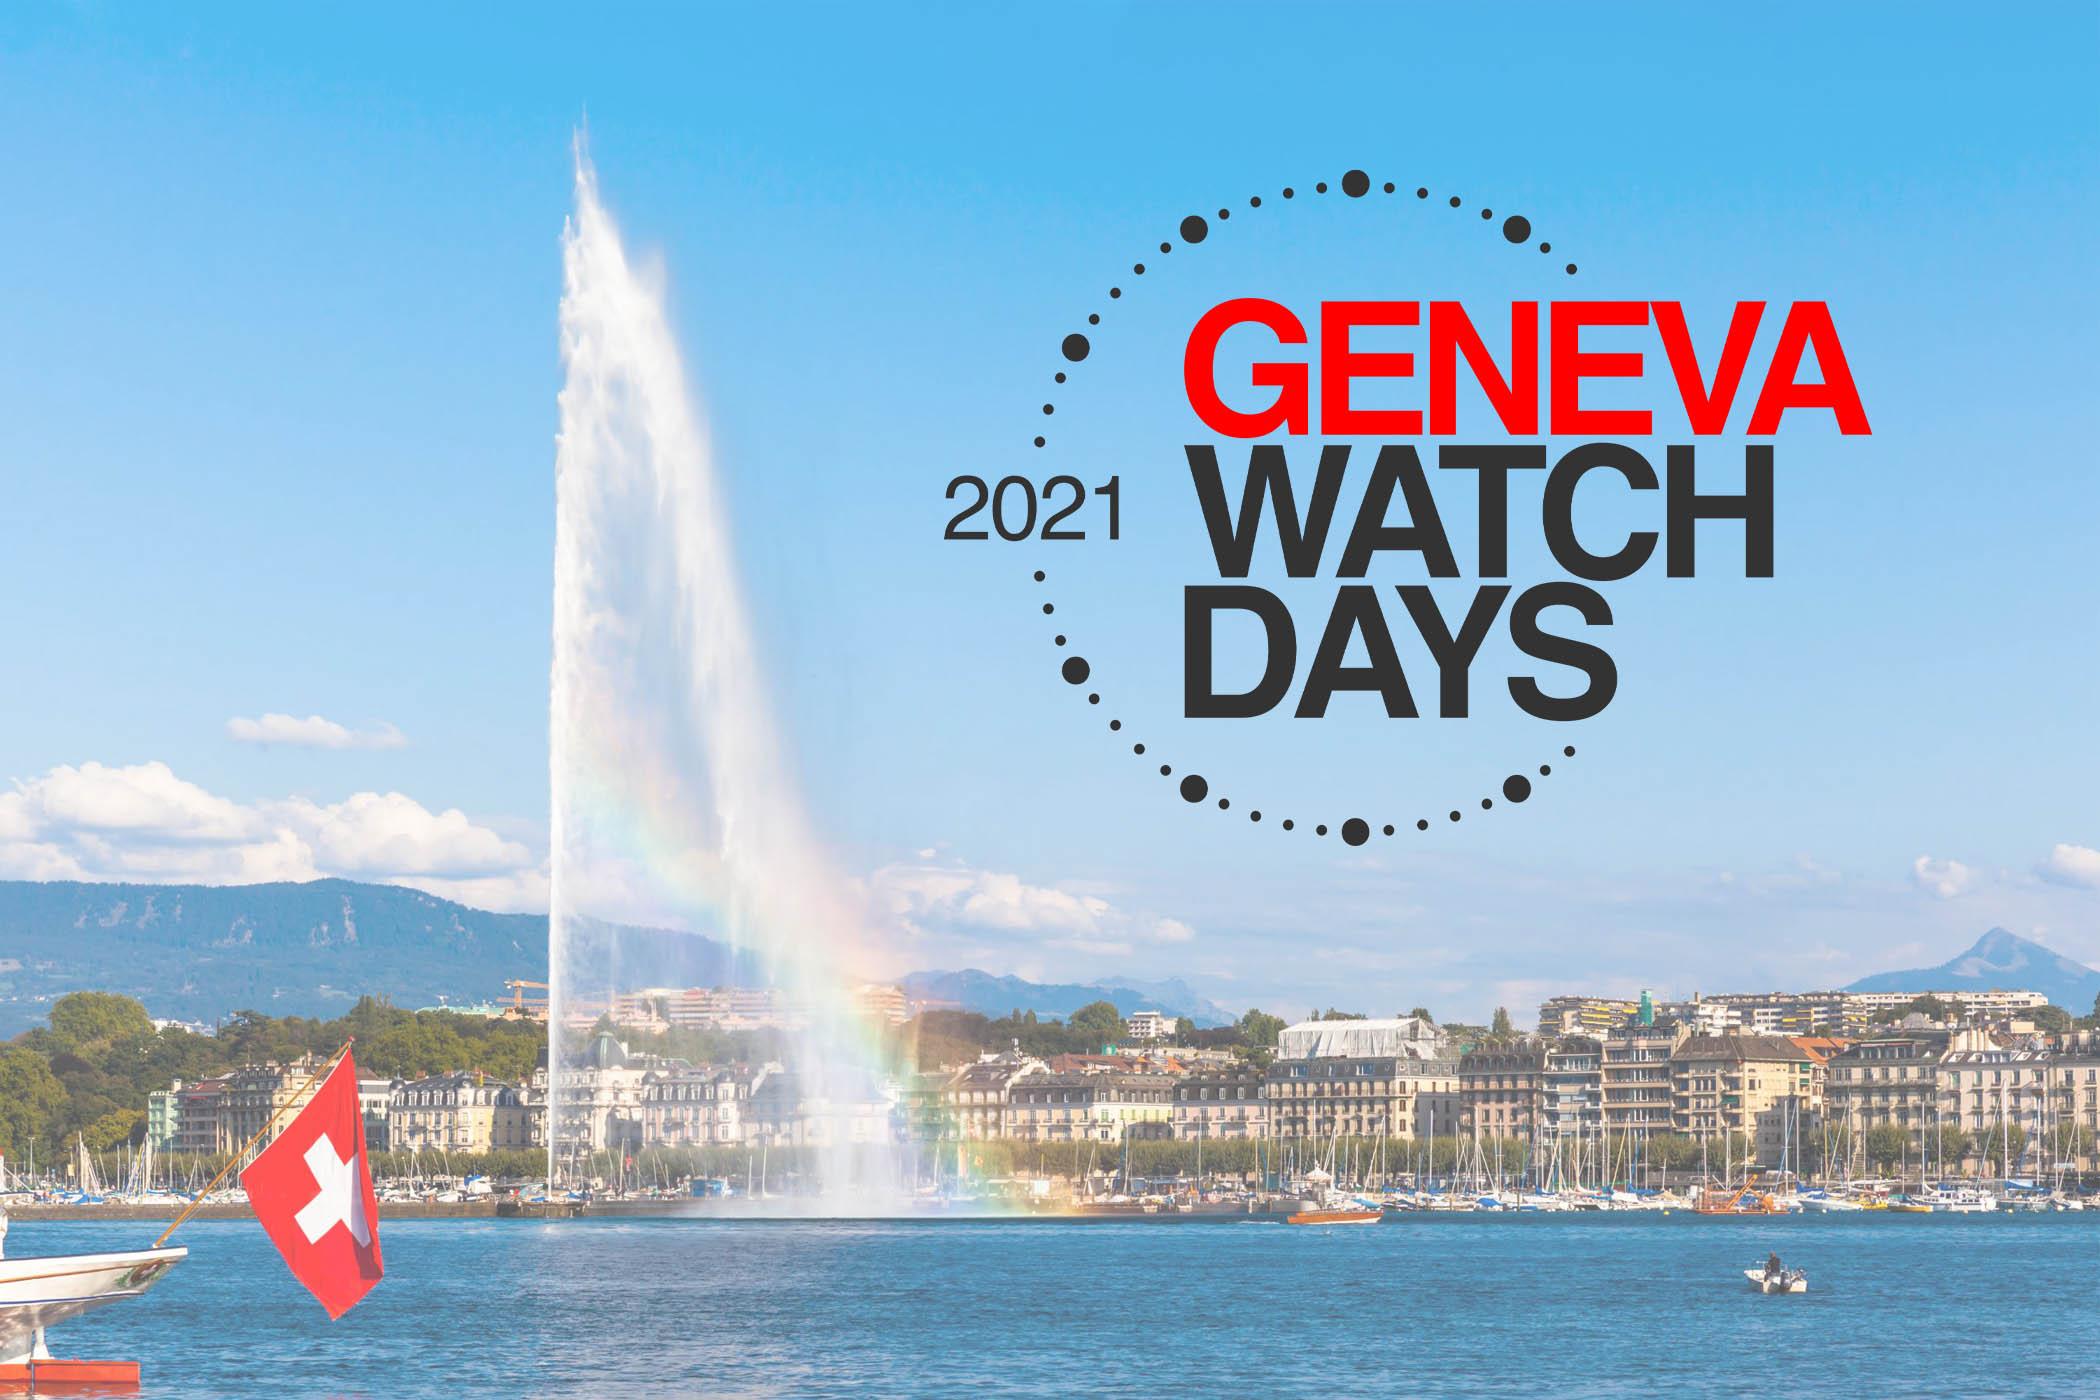 Geneva Watch Days 2021 announcing